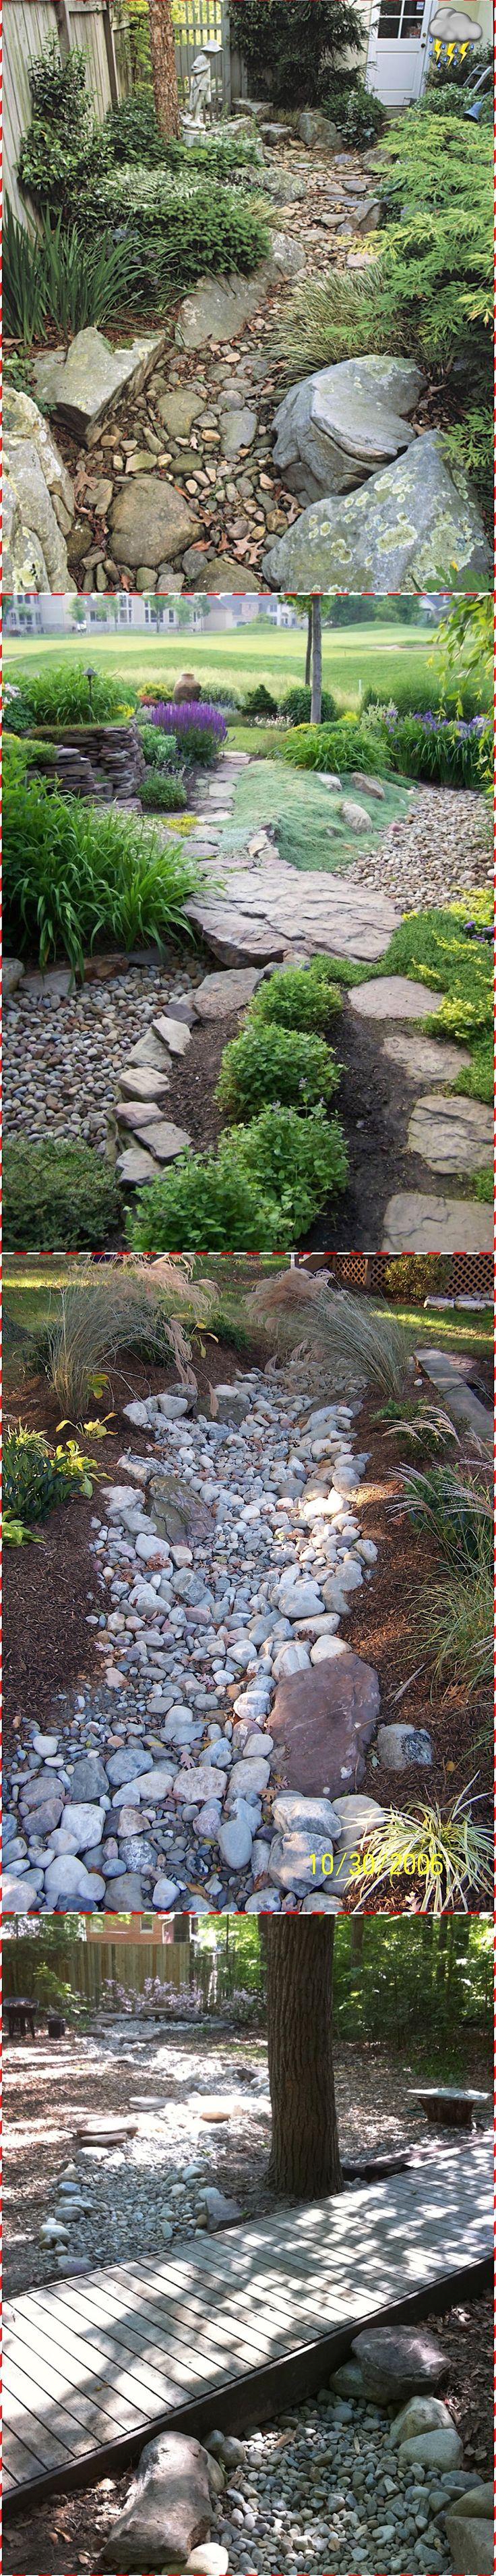 25 Gorgeous Dry Creek Beds | Panoramic Garden Ideas ~ Clipboards | @styleestateboardboardboardboardboardboardboardboardboardboardboardboardboardboardboardboardboardboardboardboardboardboardboardboardboardboardboardboardboardboardboardboardboardboardboardboardboardboard